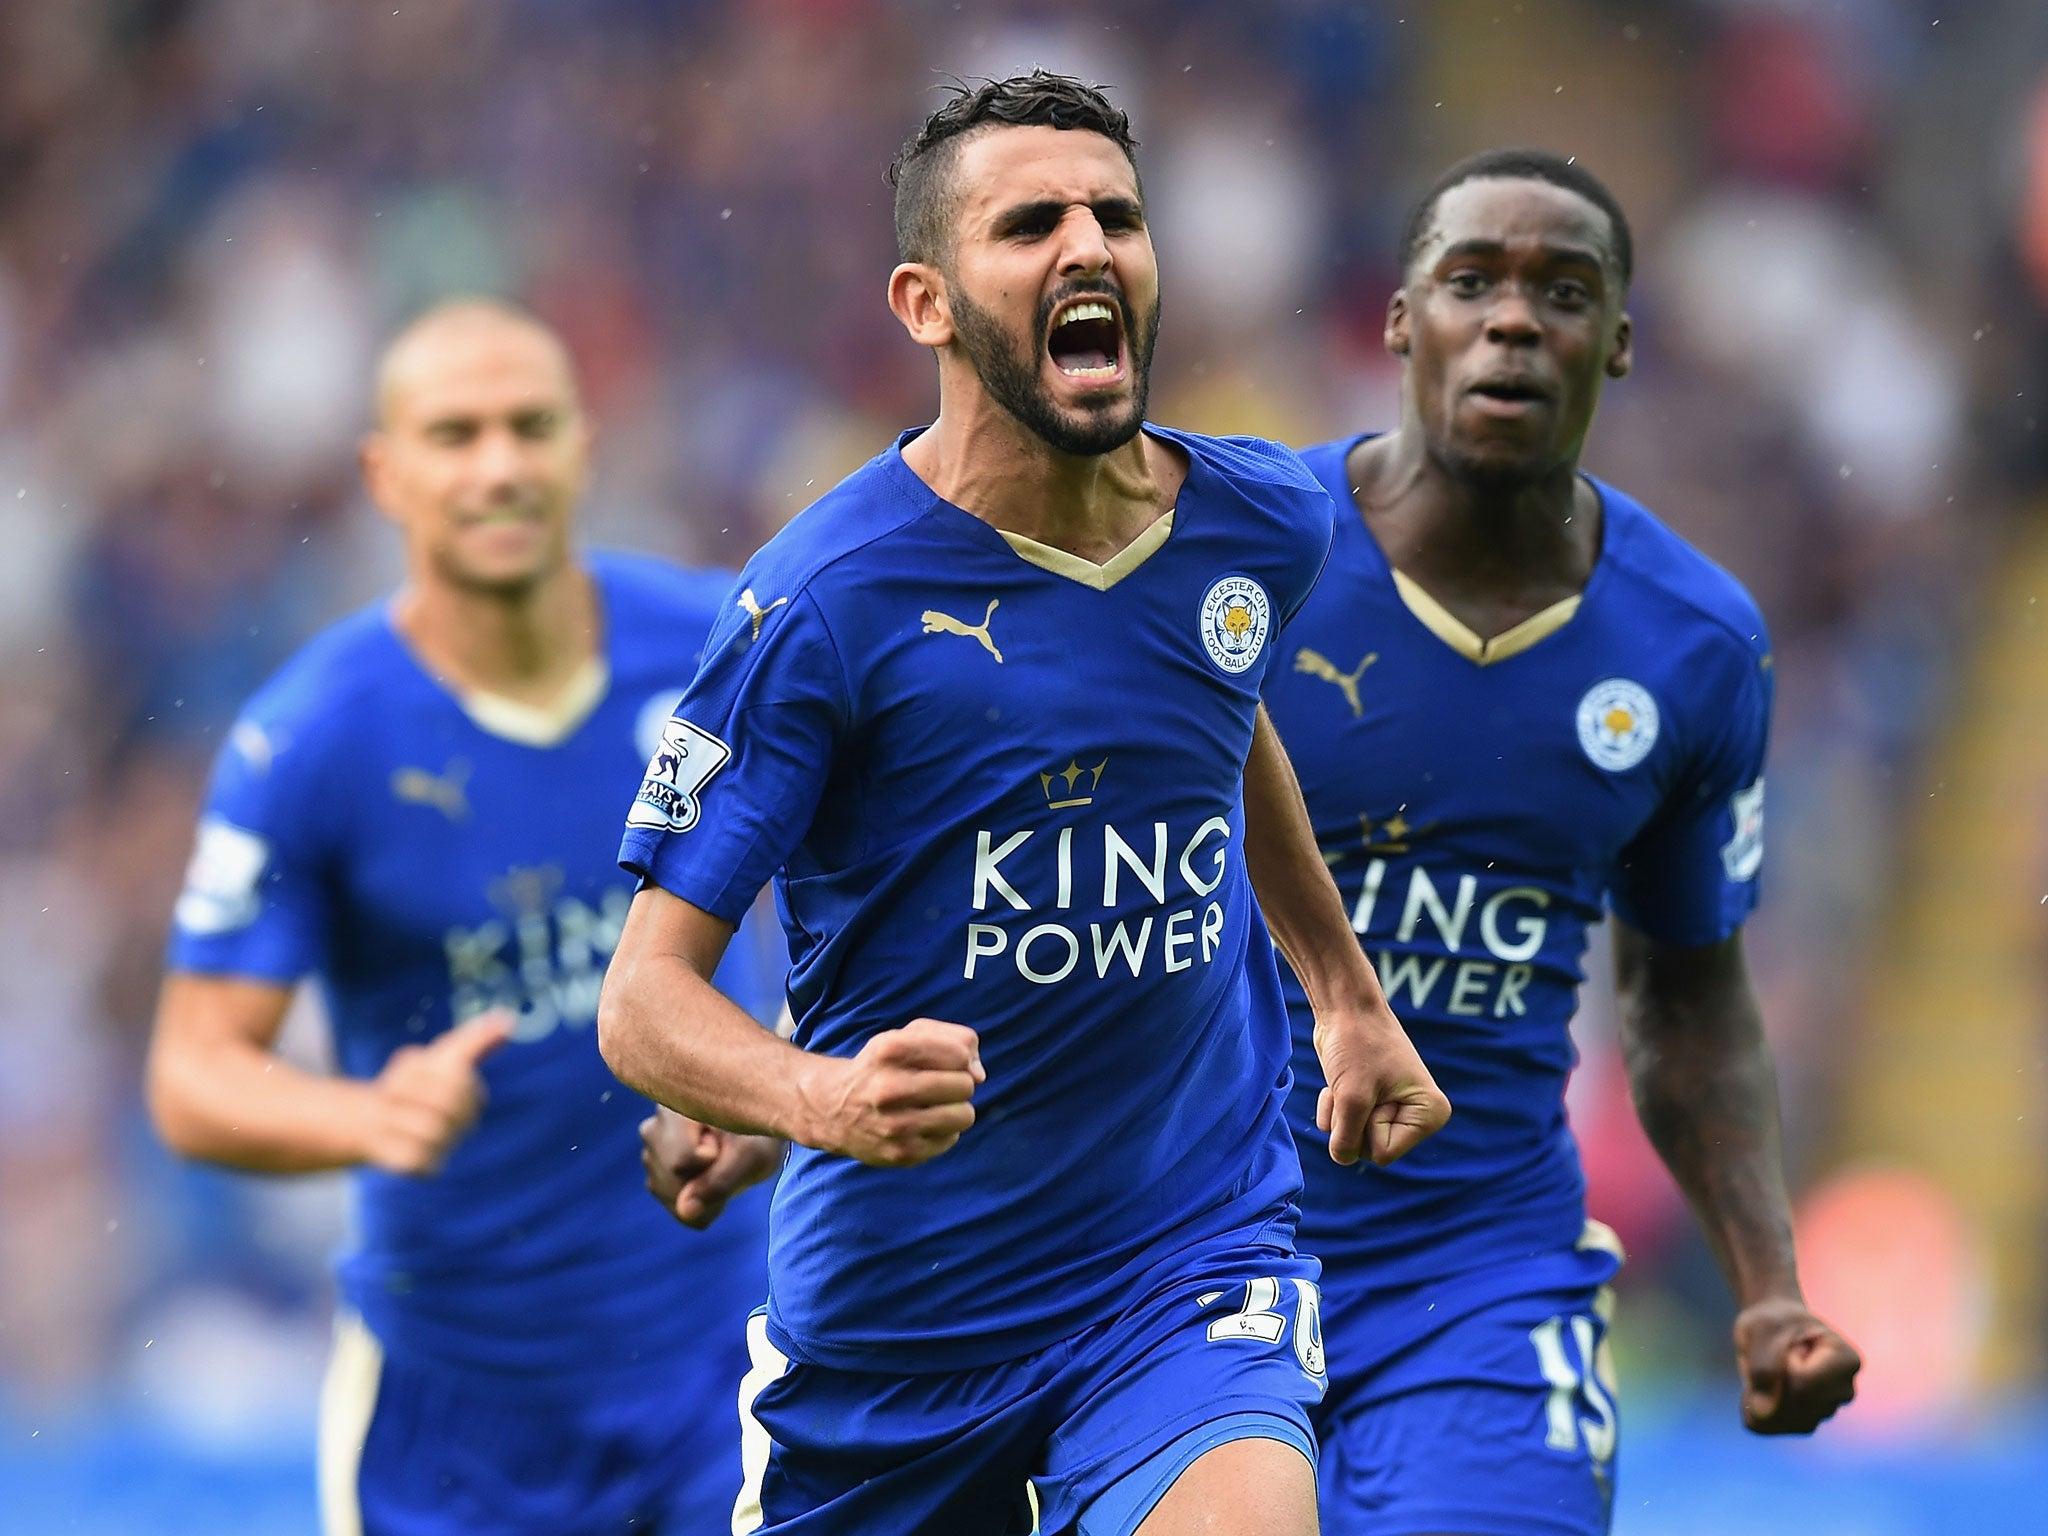 Leicester vs Tottenham match report Riyad Mahrez continues his